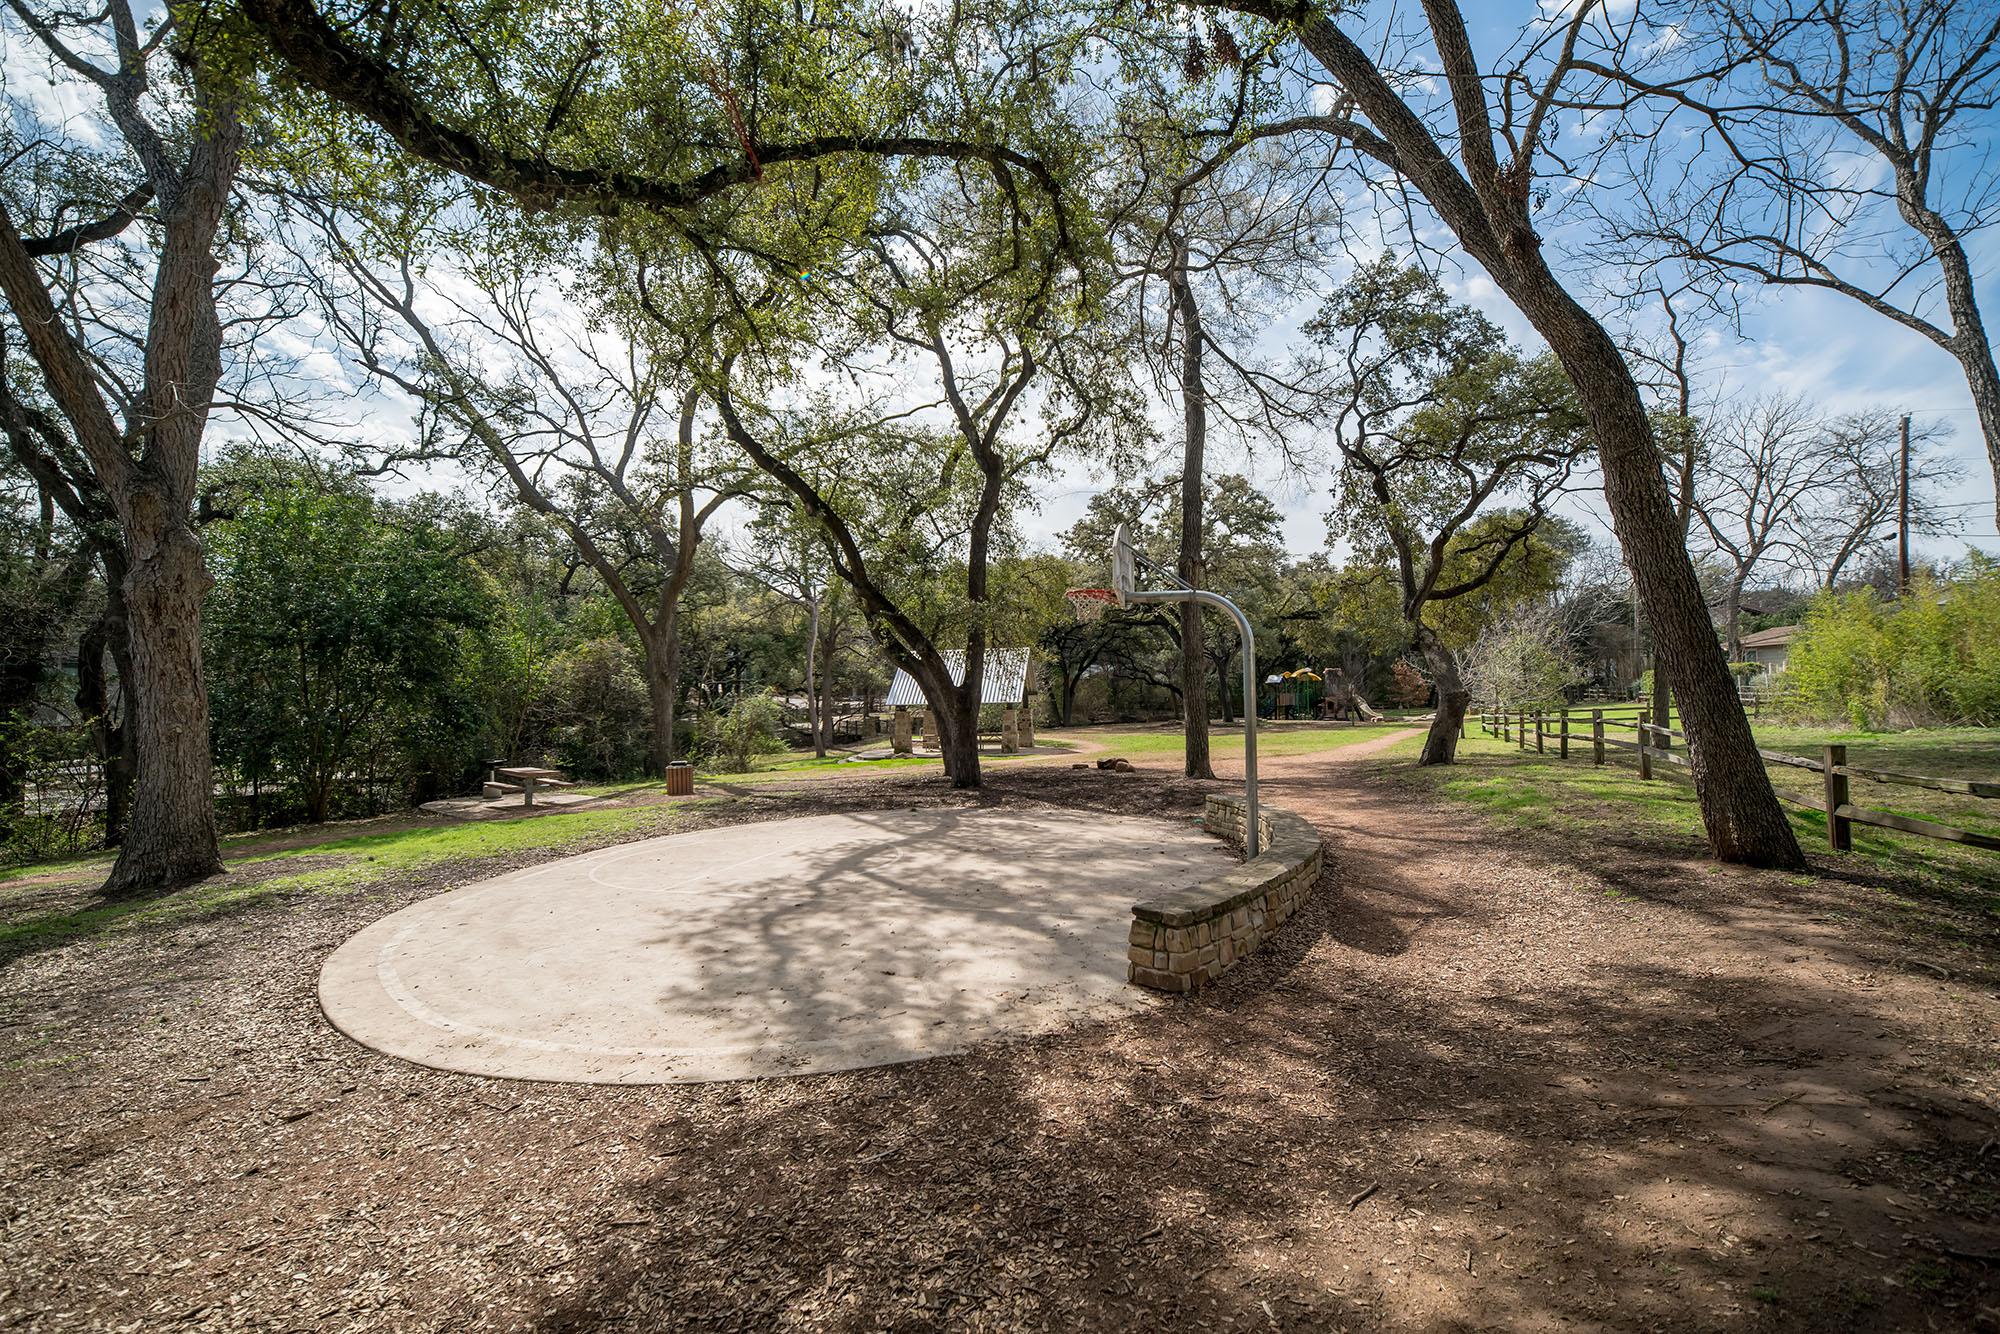 Adjacent Lasseter Park